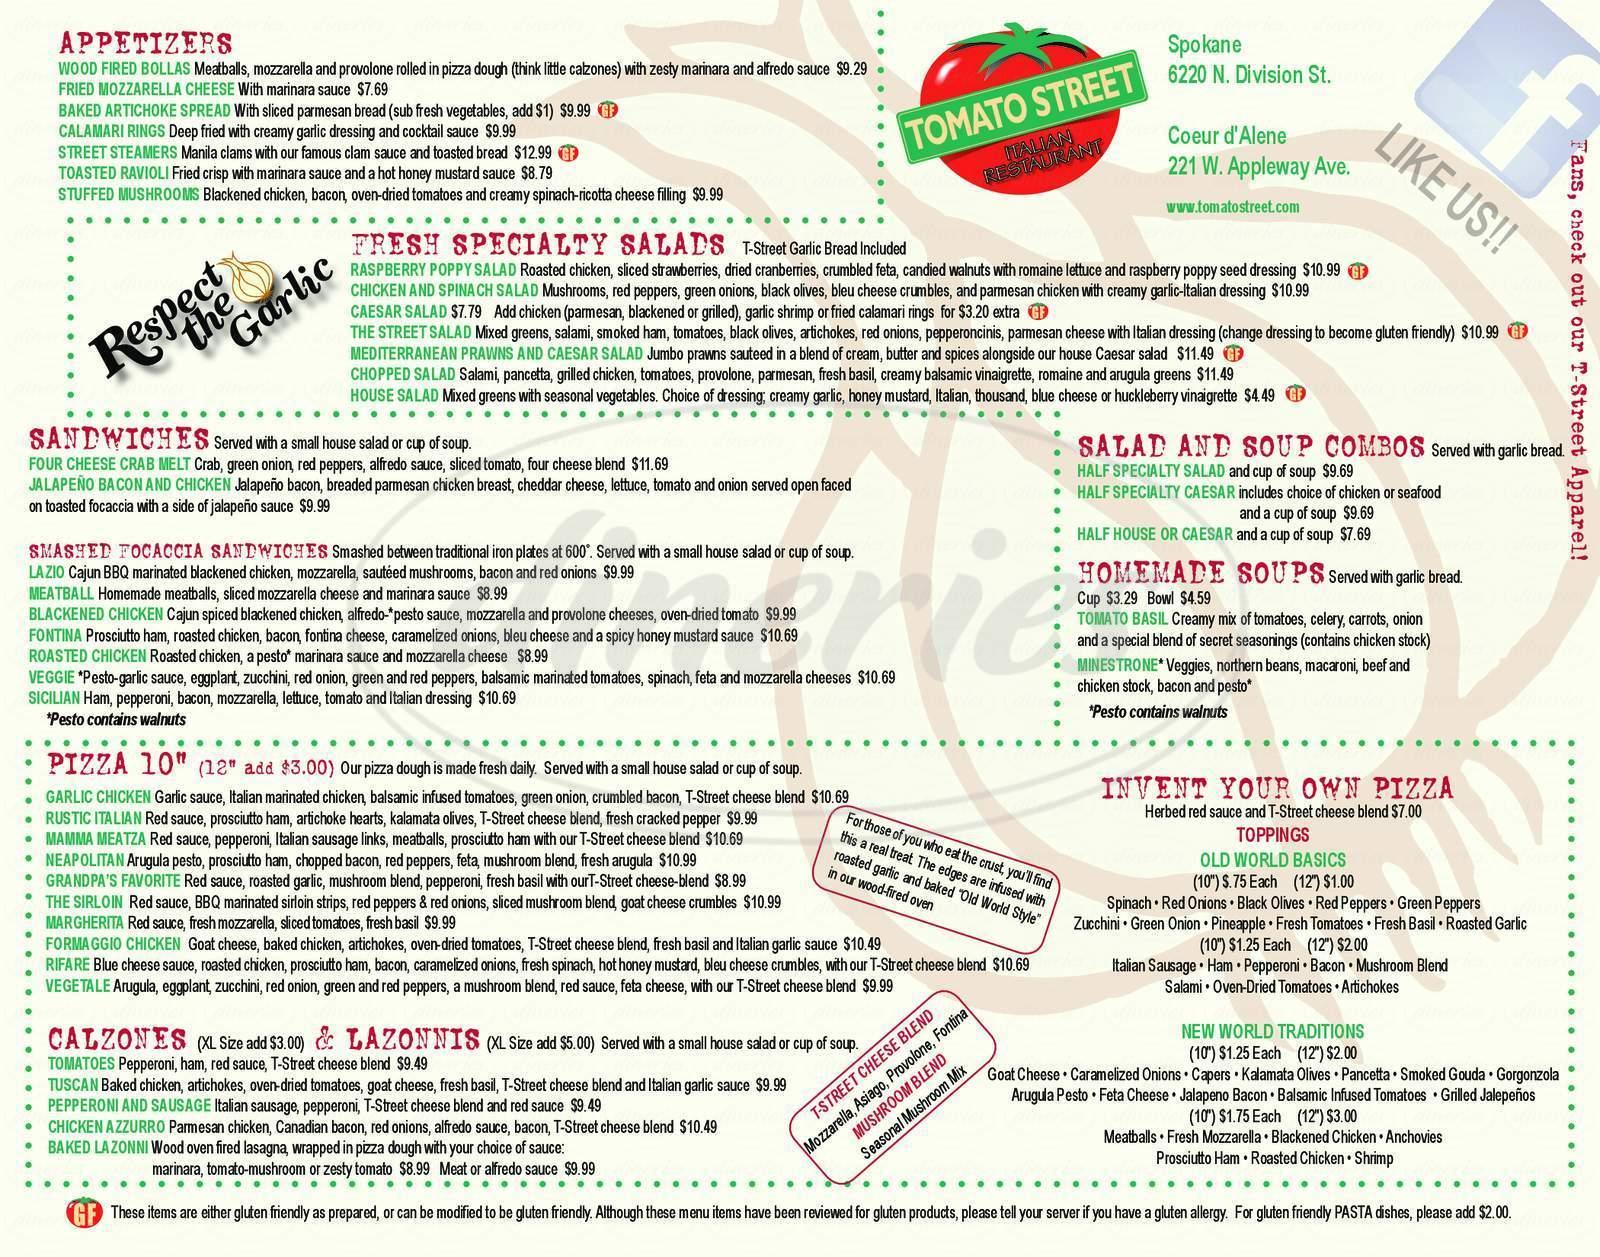 menu for Tomato Street